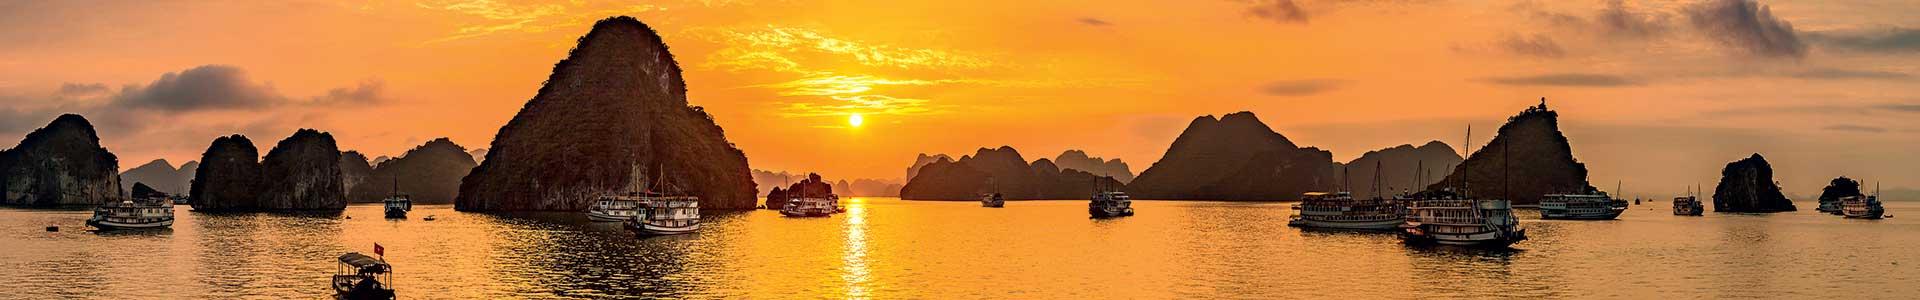 Voyage au Vietnam - TUI